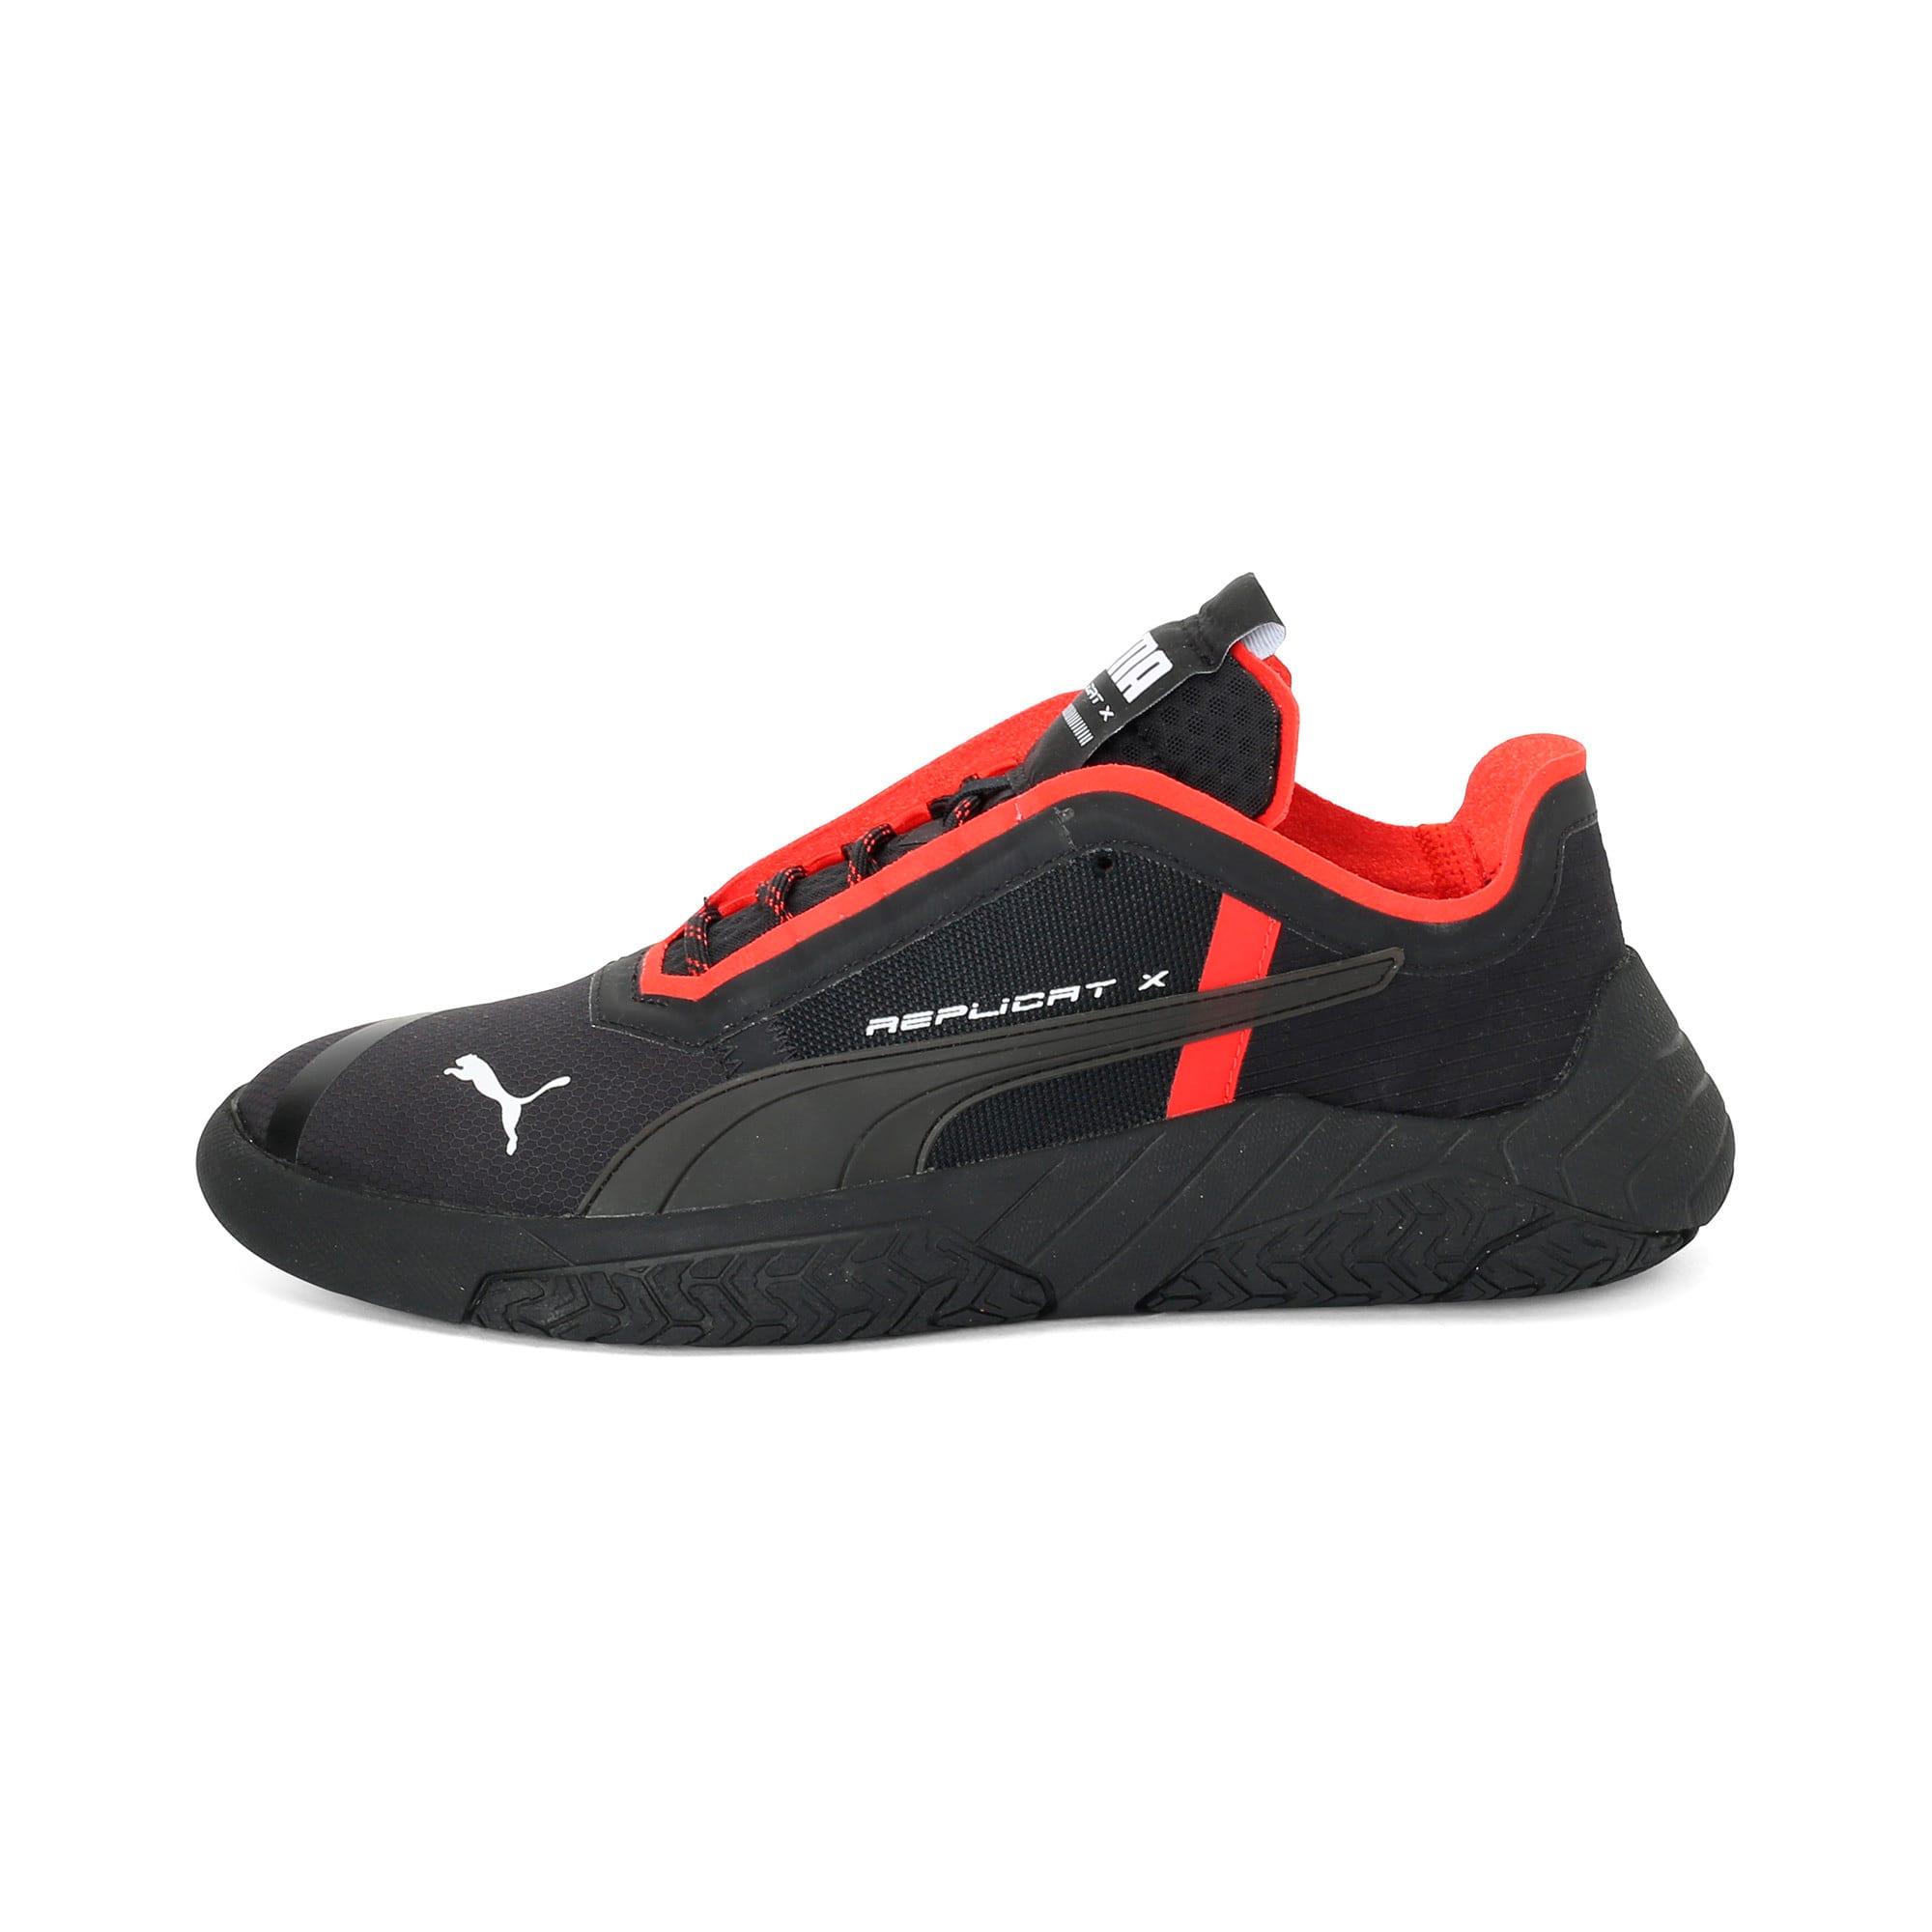 Thumbnail 1 of Replicat-X Circuit Trainers, Puma Black-Puma Red, medium-IND